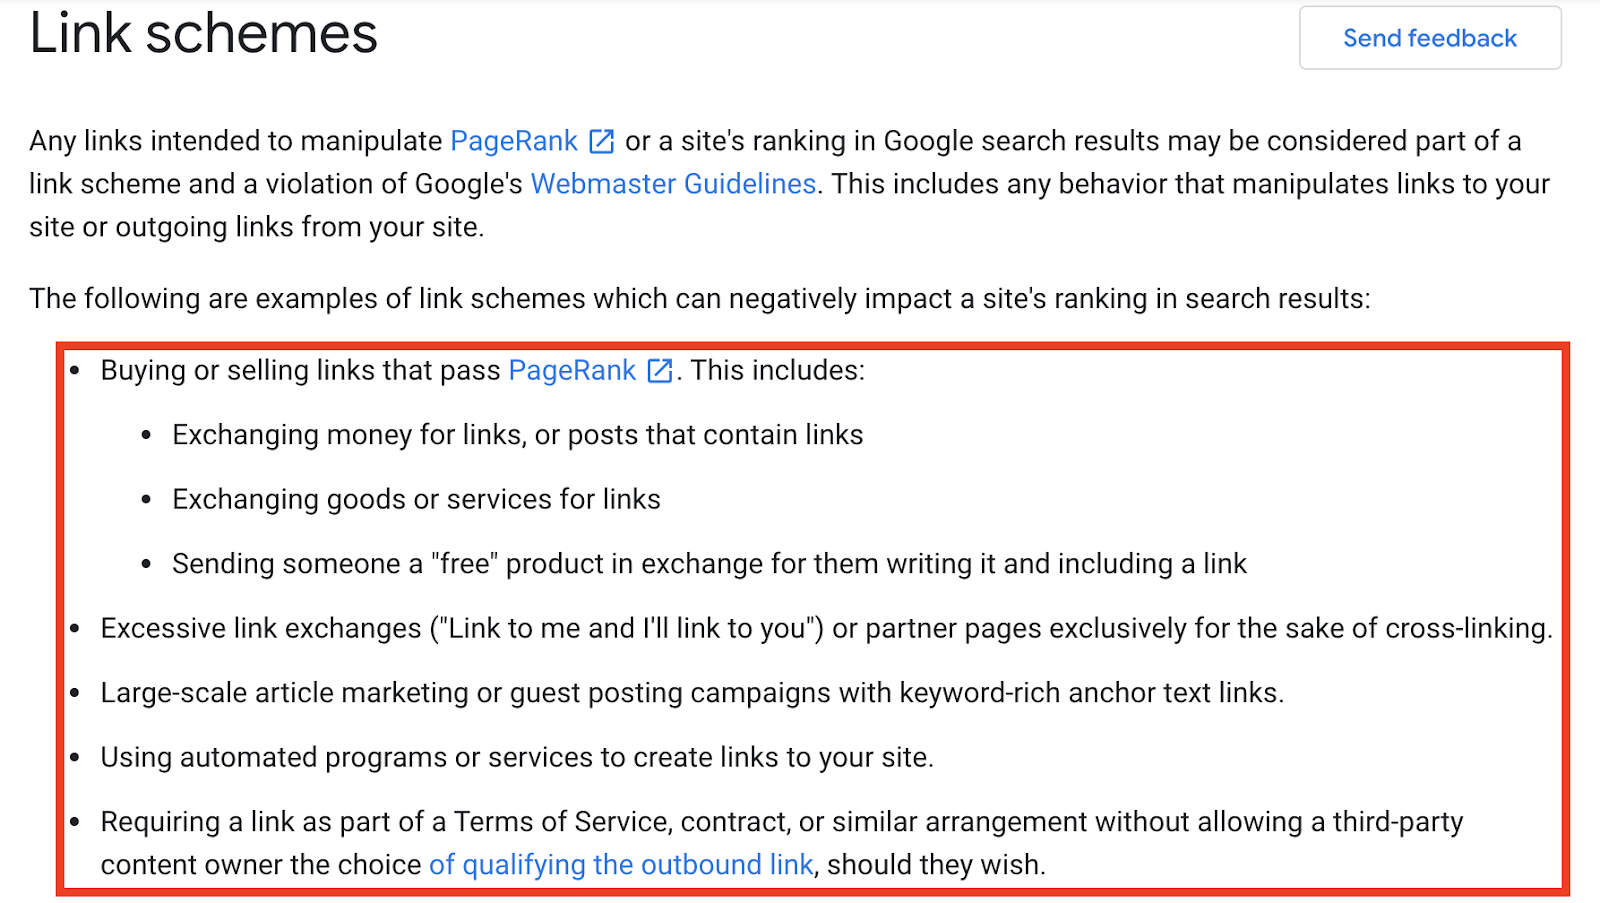 List of negative link schemes